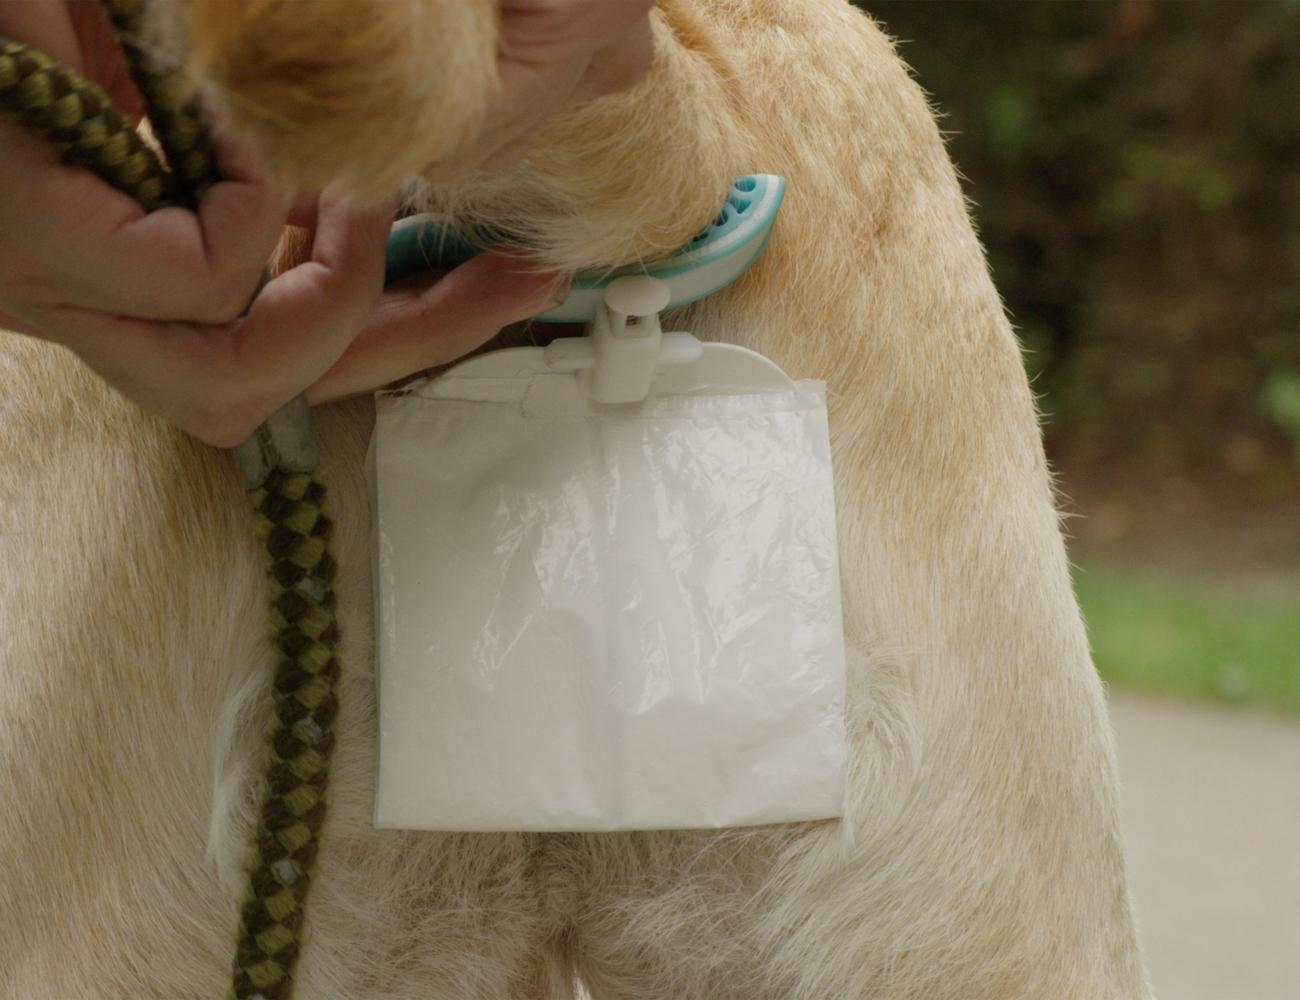 Piqapoo Hands-Free Dog Poop Collector